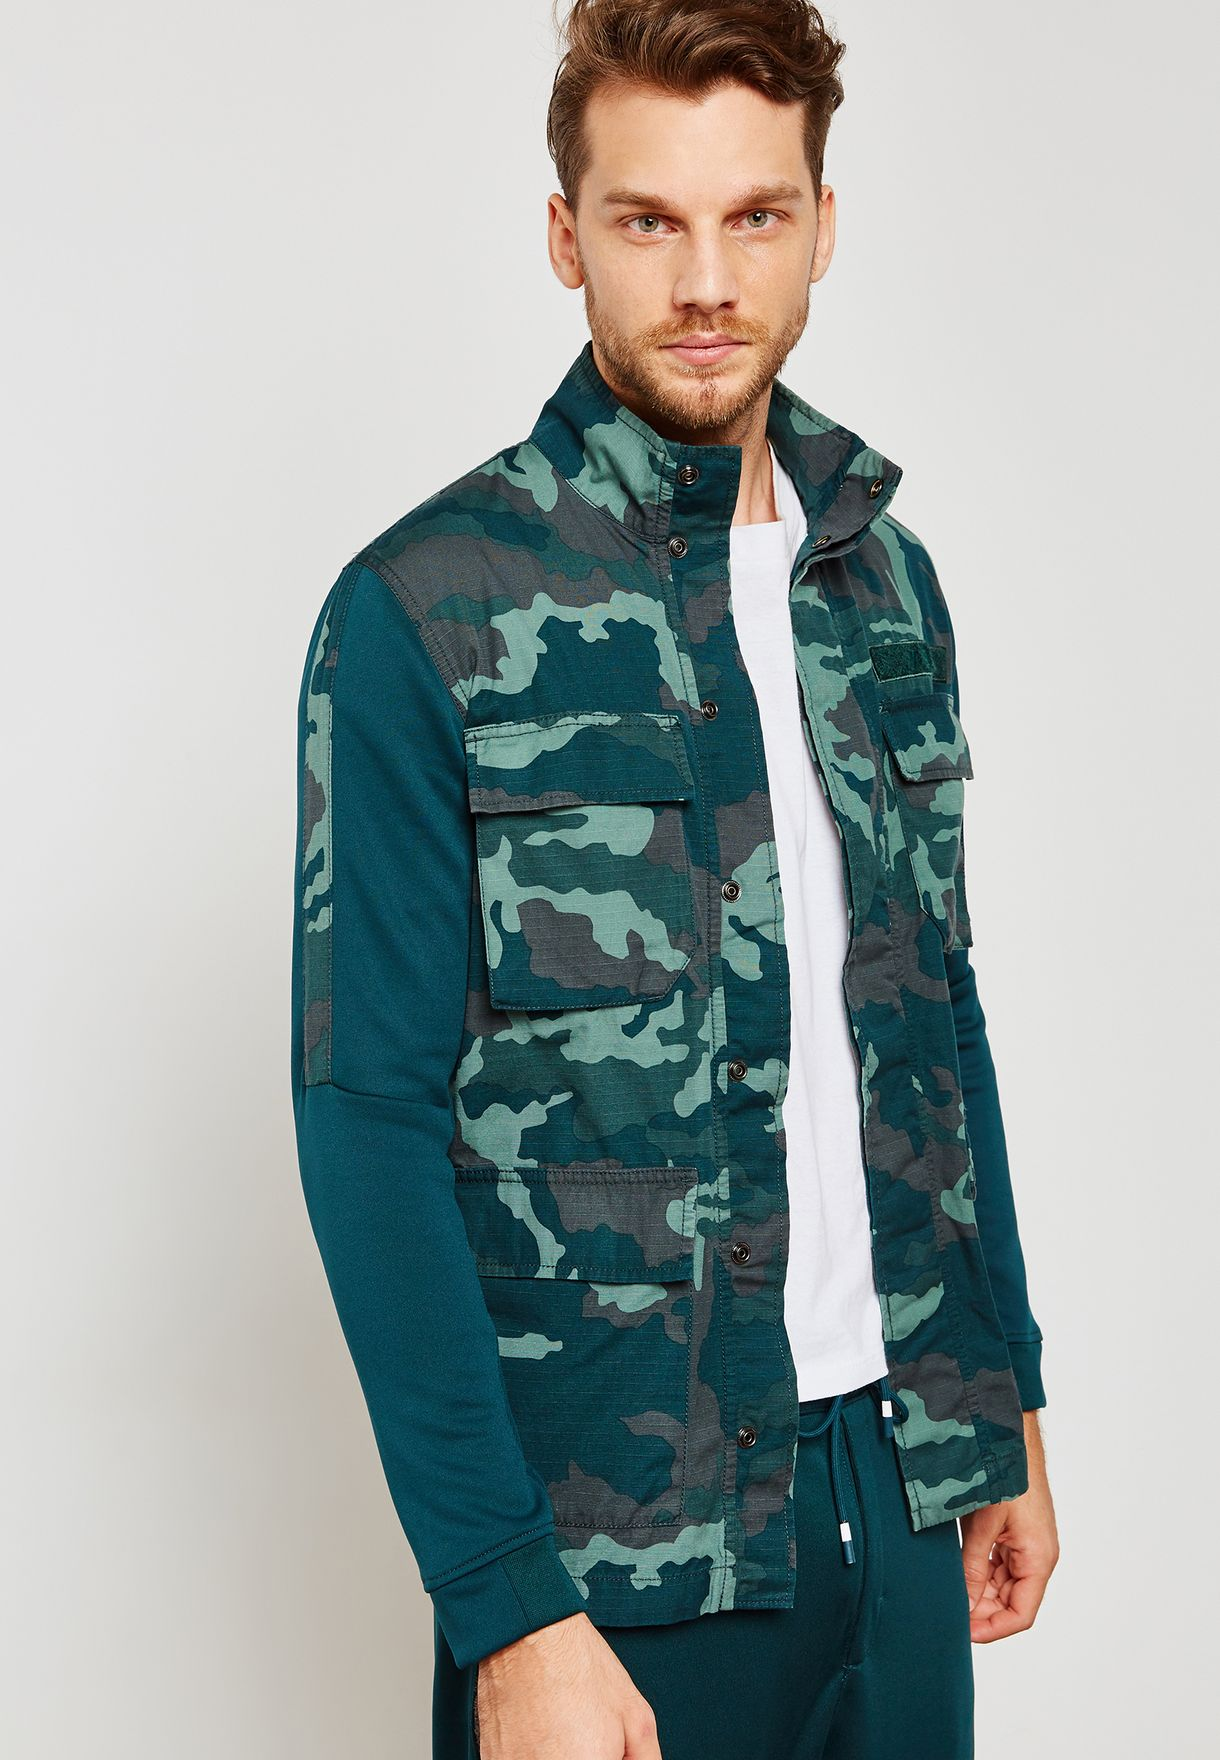 e9cb96cf1d64 Shop Nike prints NSW Camo Jacket 928621-372 for Men in Saudi ...